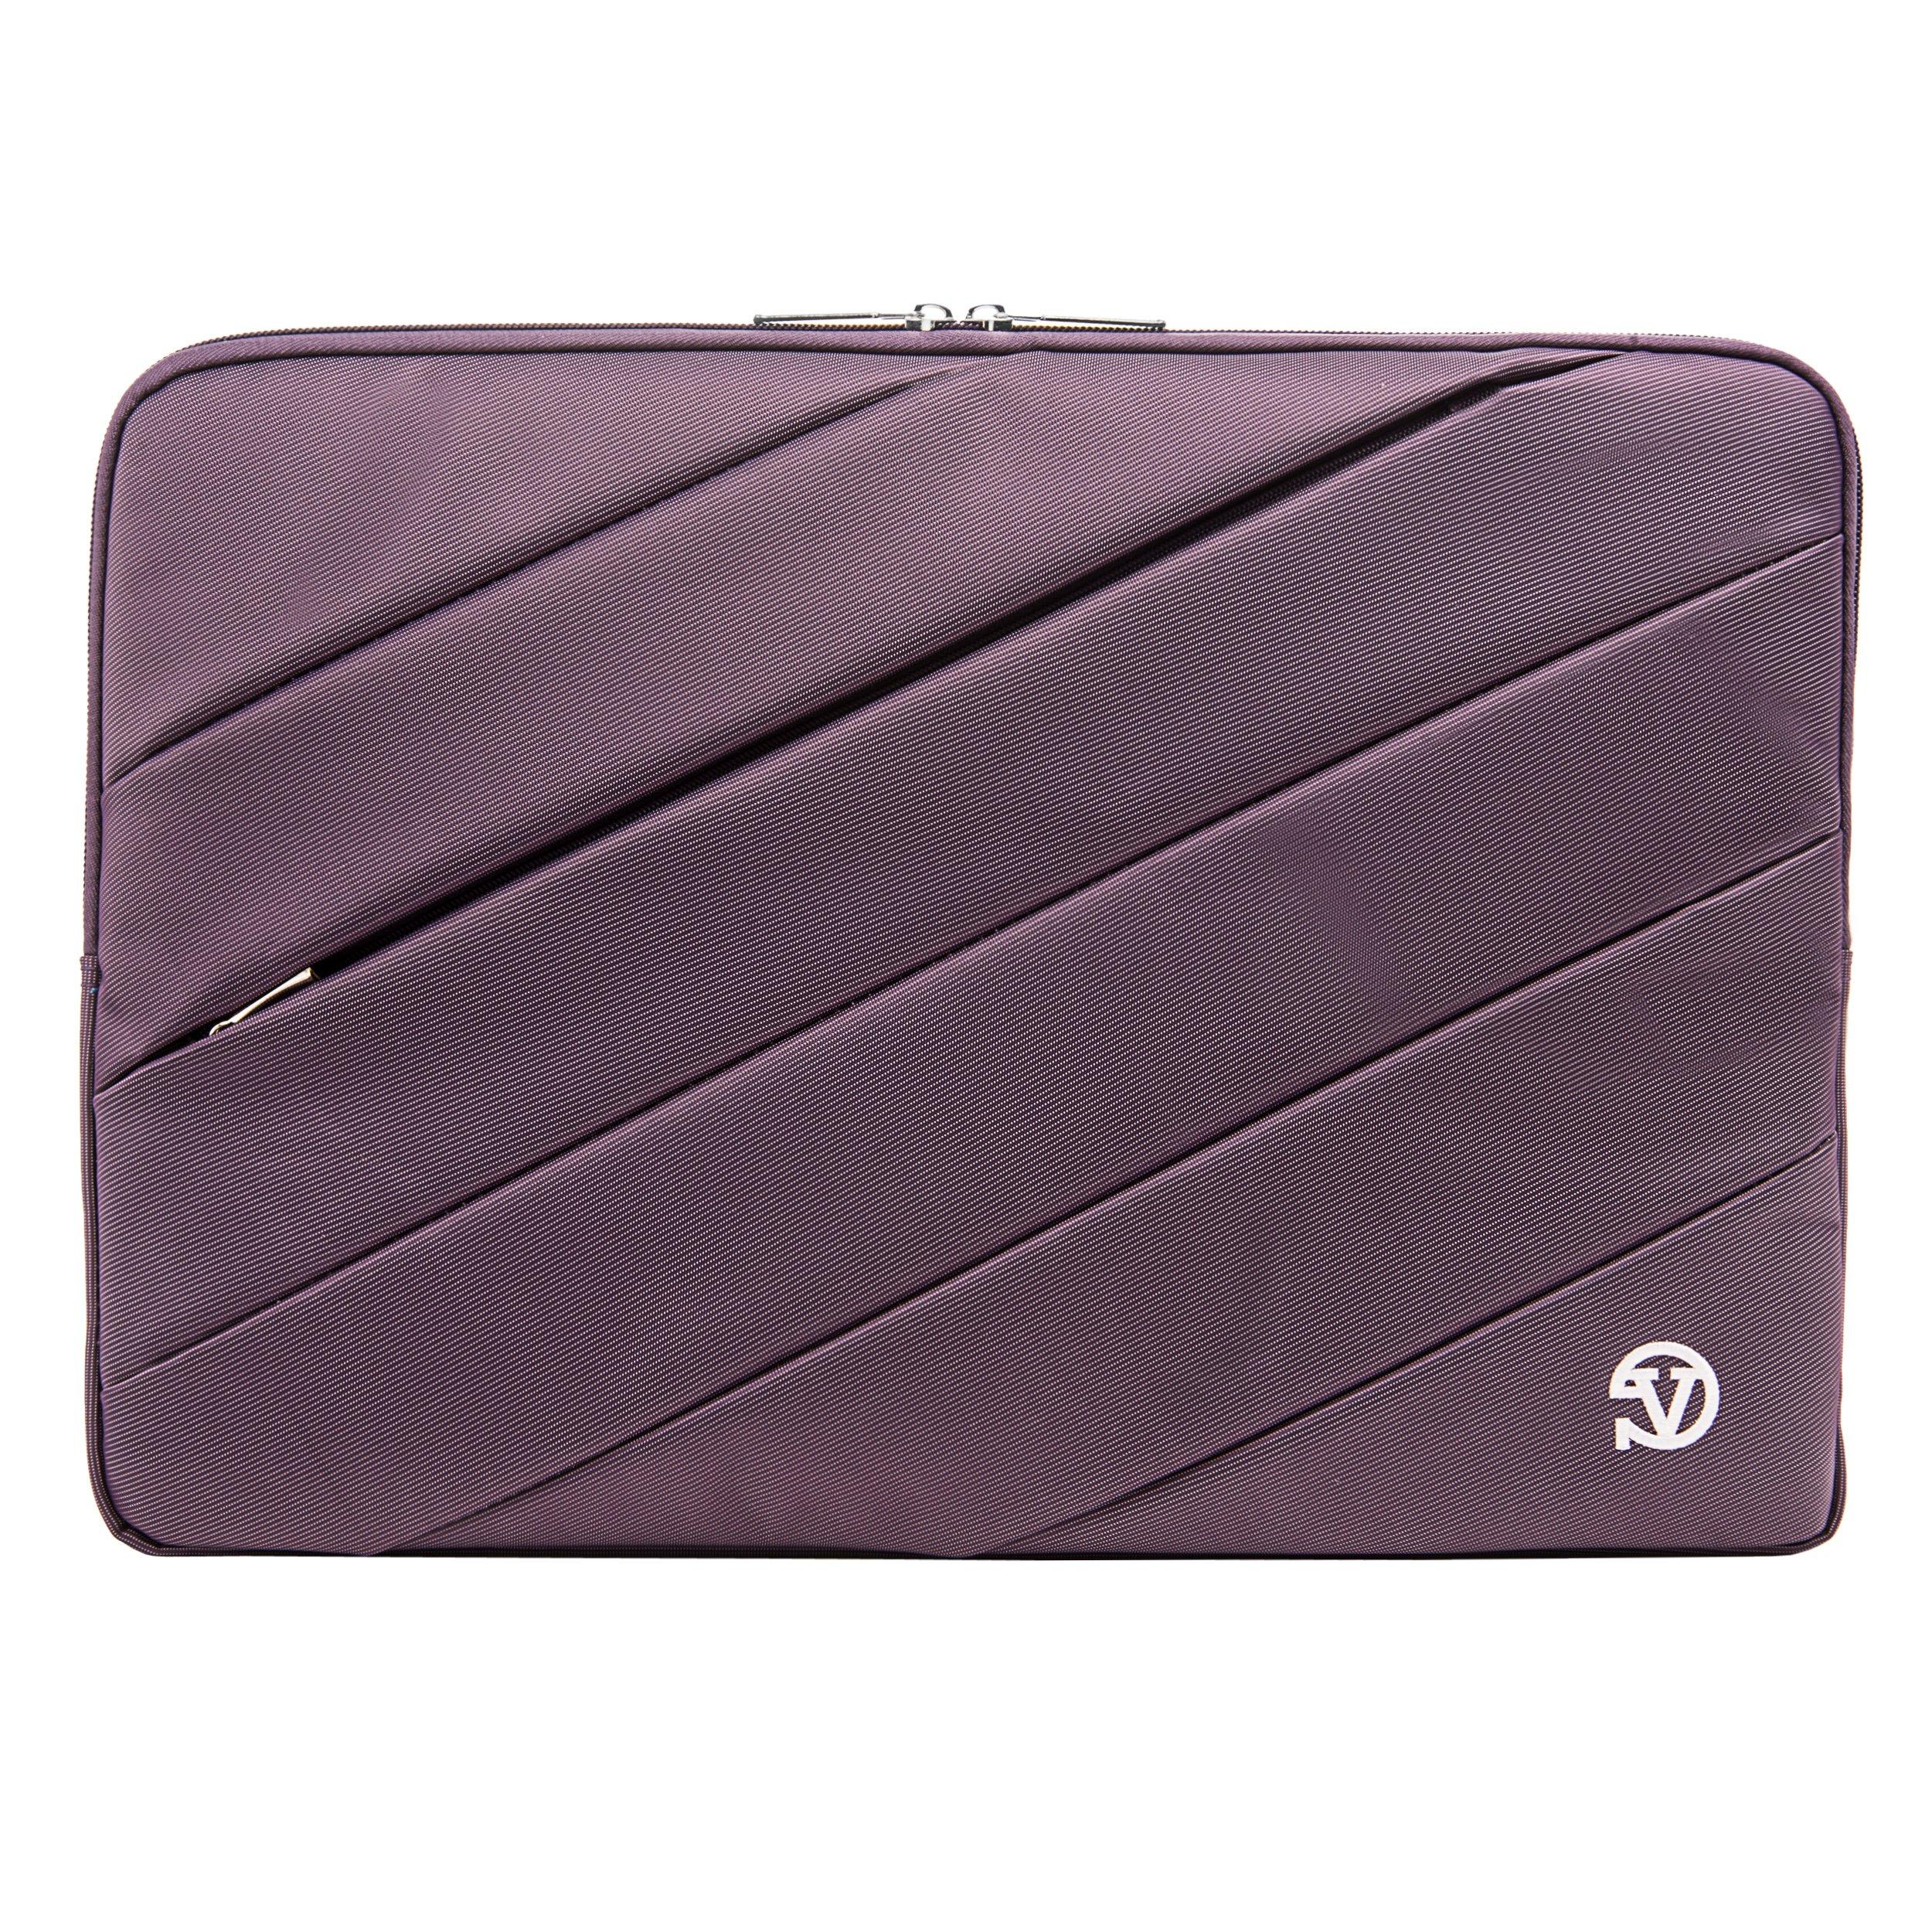 Jam Sleeve for 13-13.3'' Laptops - Macbook, Chromebook, Inspiron, Notebook, Zenbook, Aspire, ATIV Book, XPS, Yoga, & Others